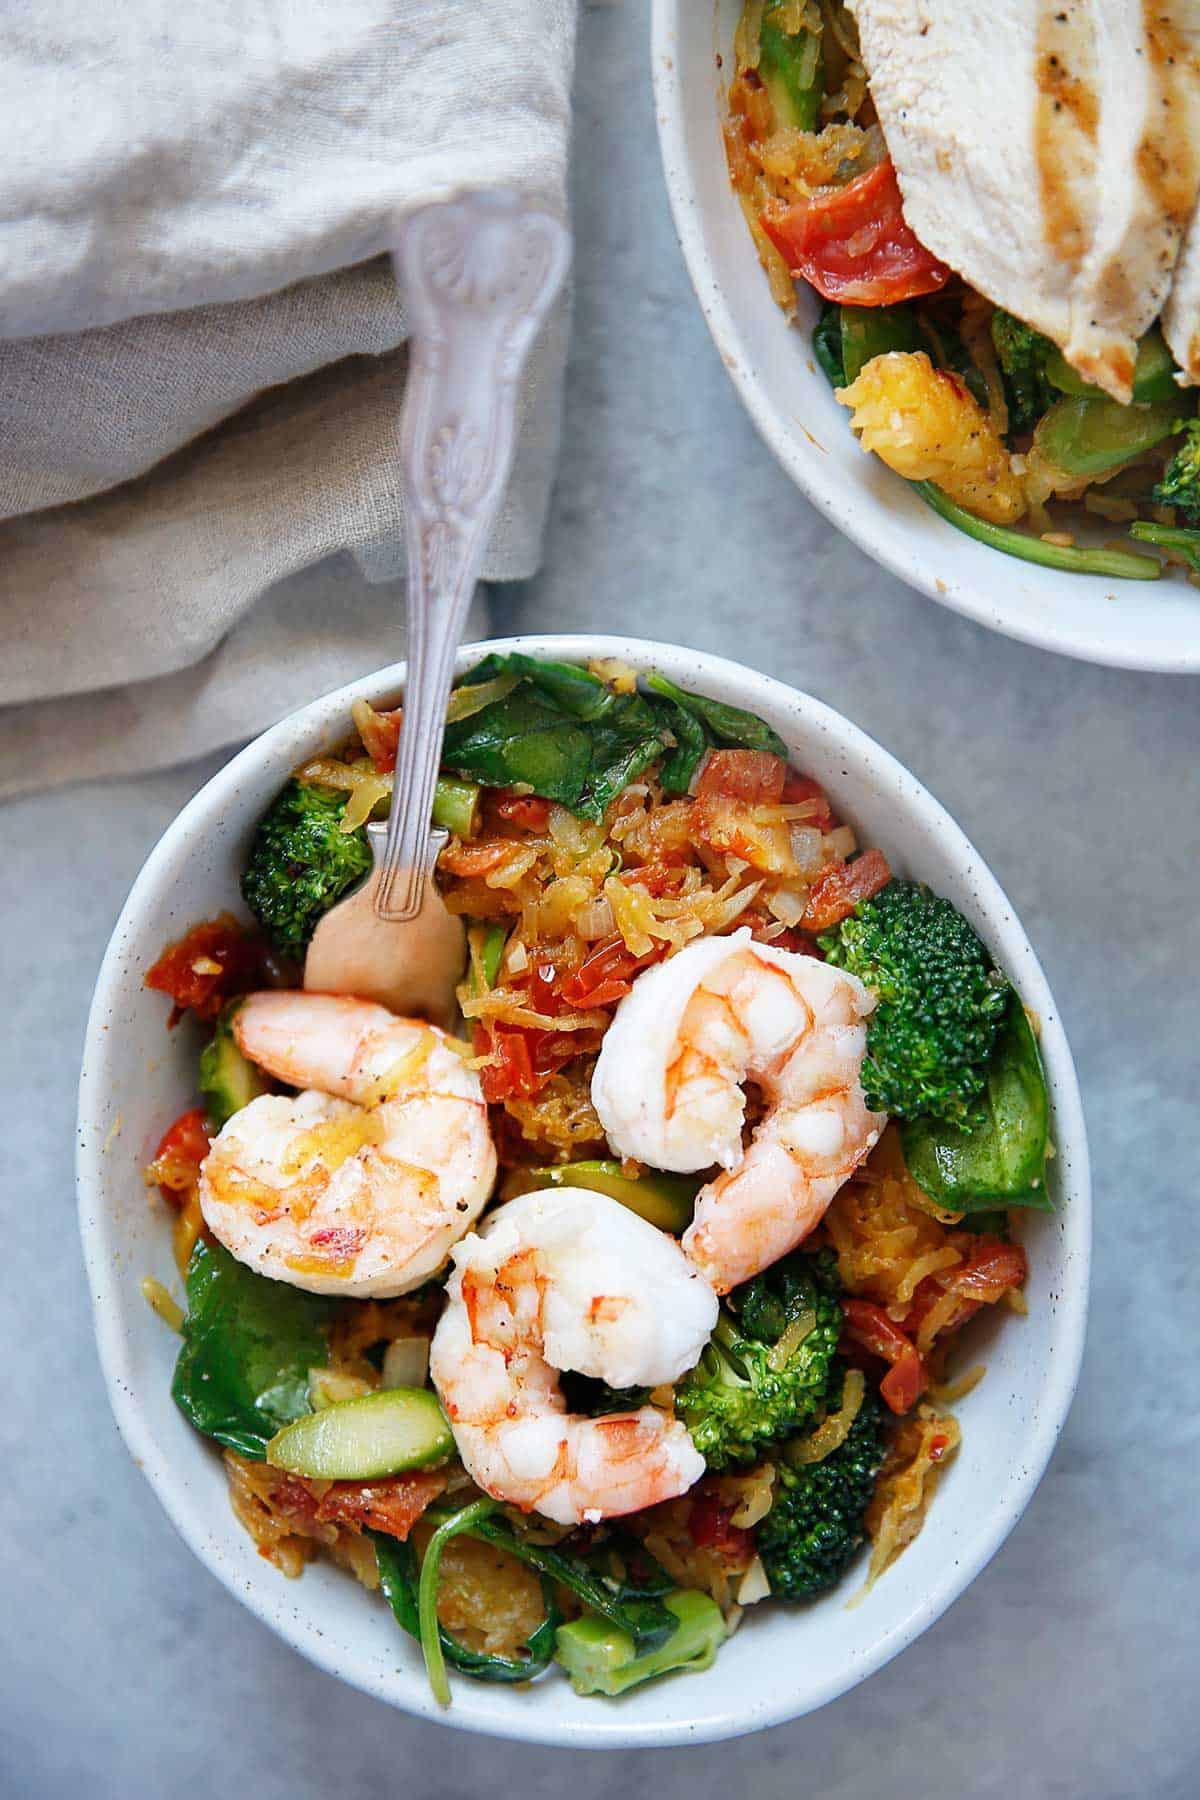 Spaghetti Squash Primavera {grain-free, dairy-free option, paleo-friendly} | Lexi's Clean Kitchen